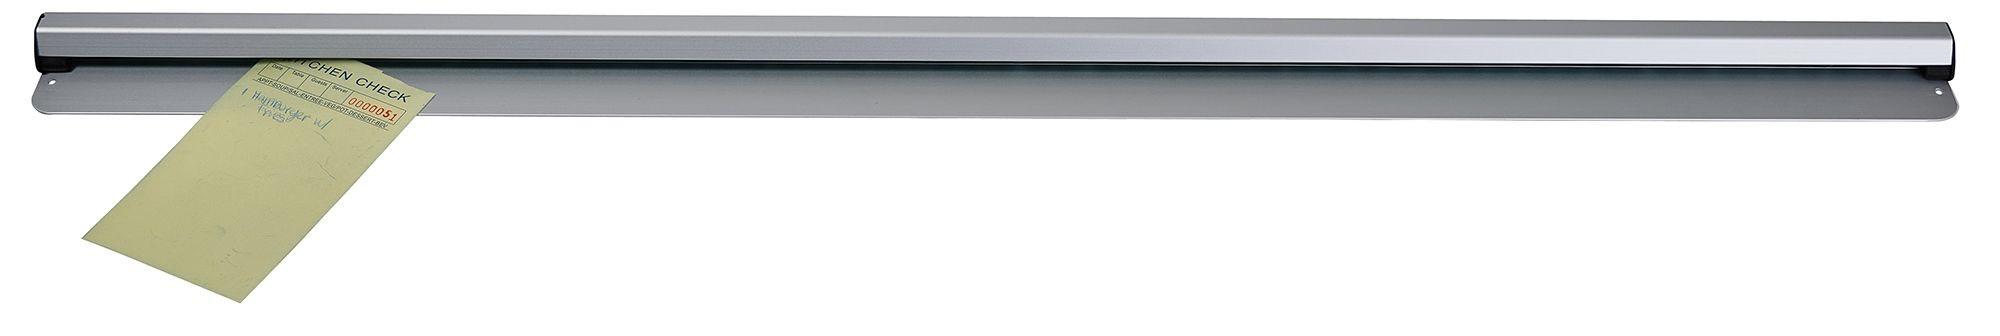 Aluminum Order Racks - 36